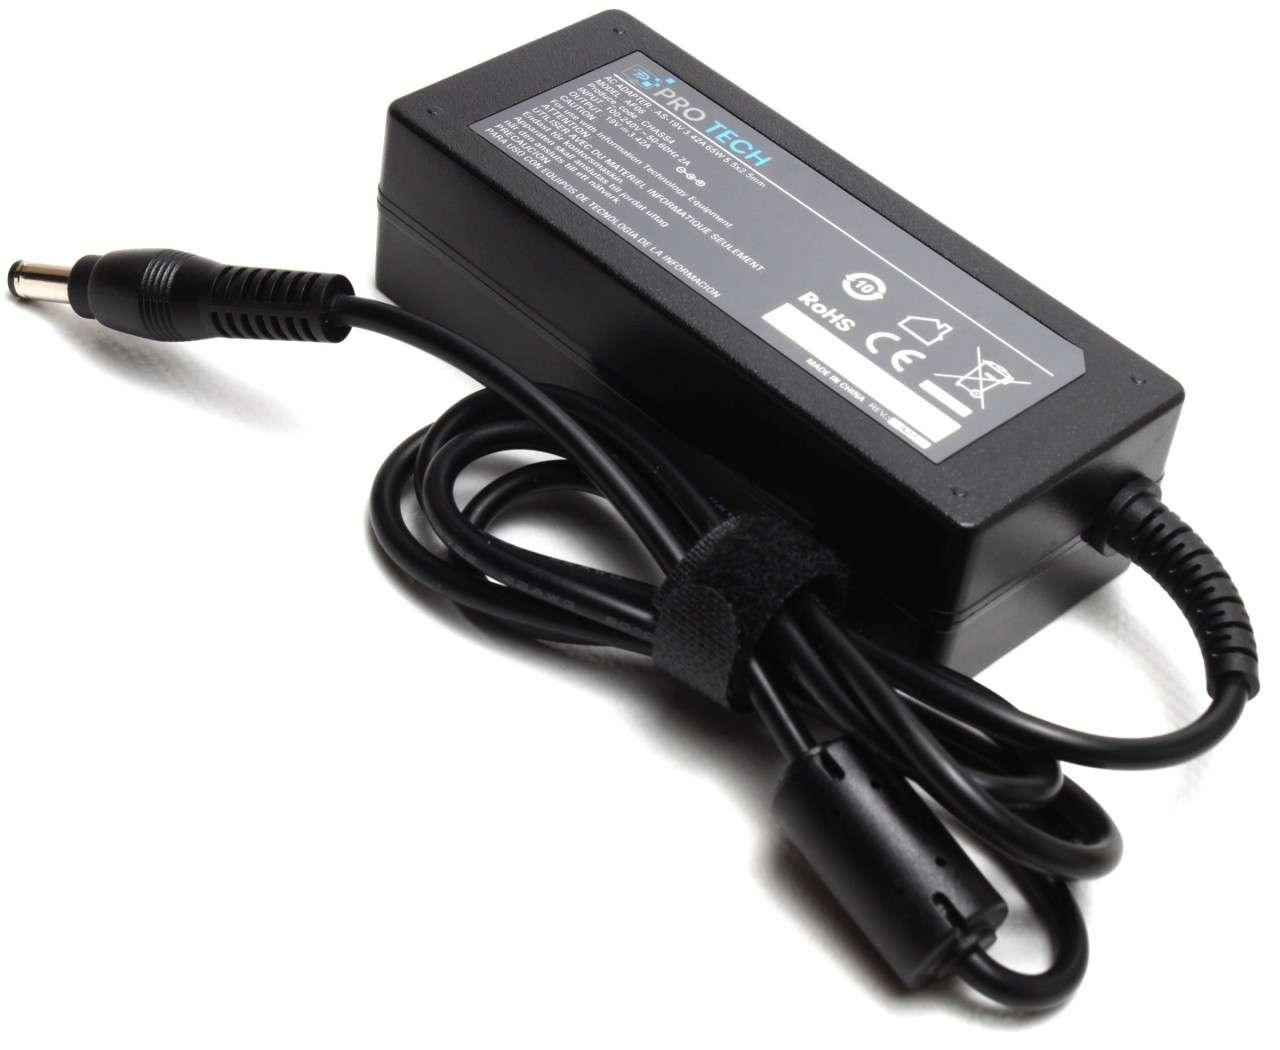 Incarcator MSI CX623 Replacement imagine powerlaptop.ro 2021